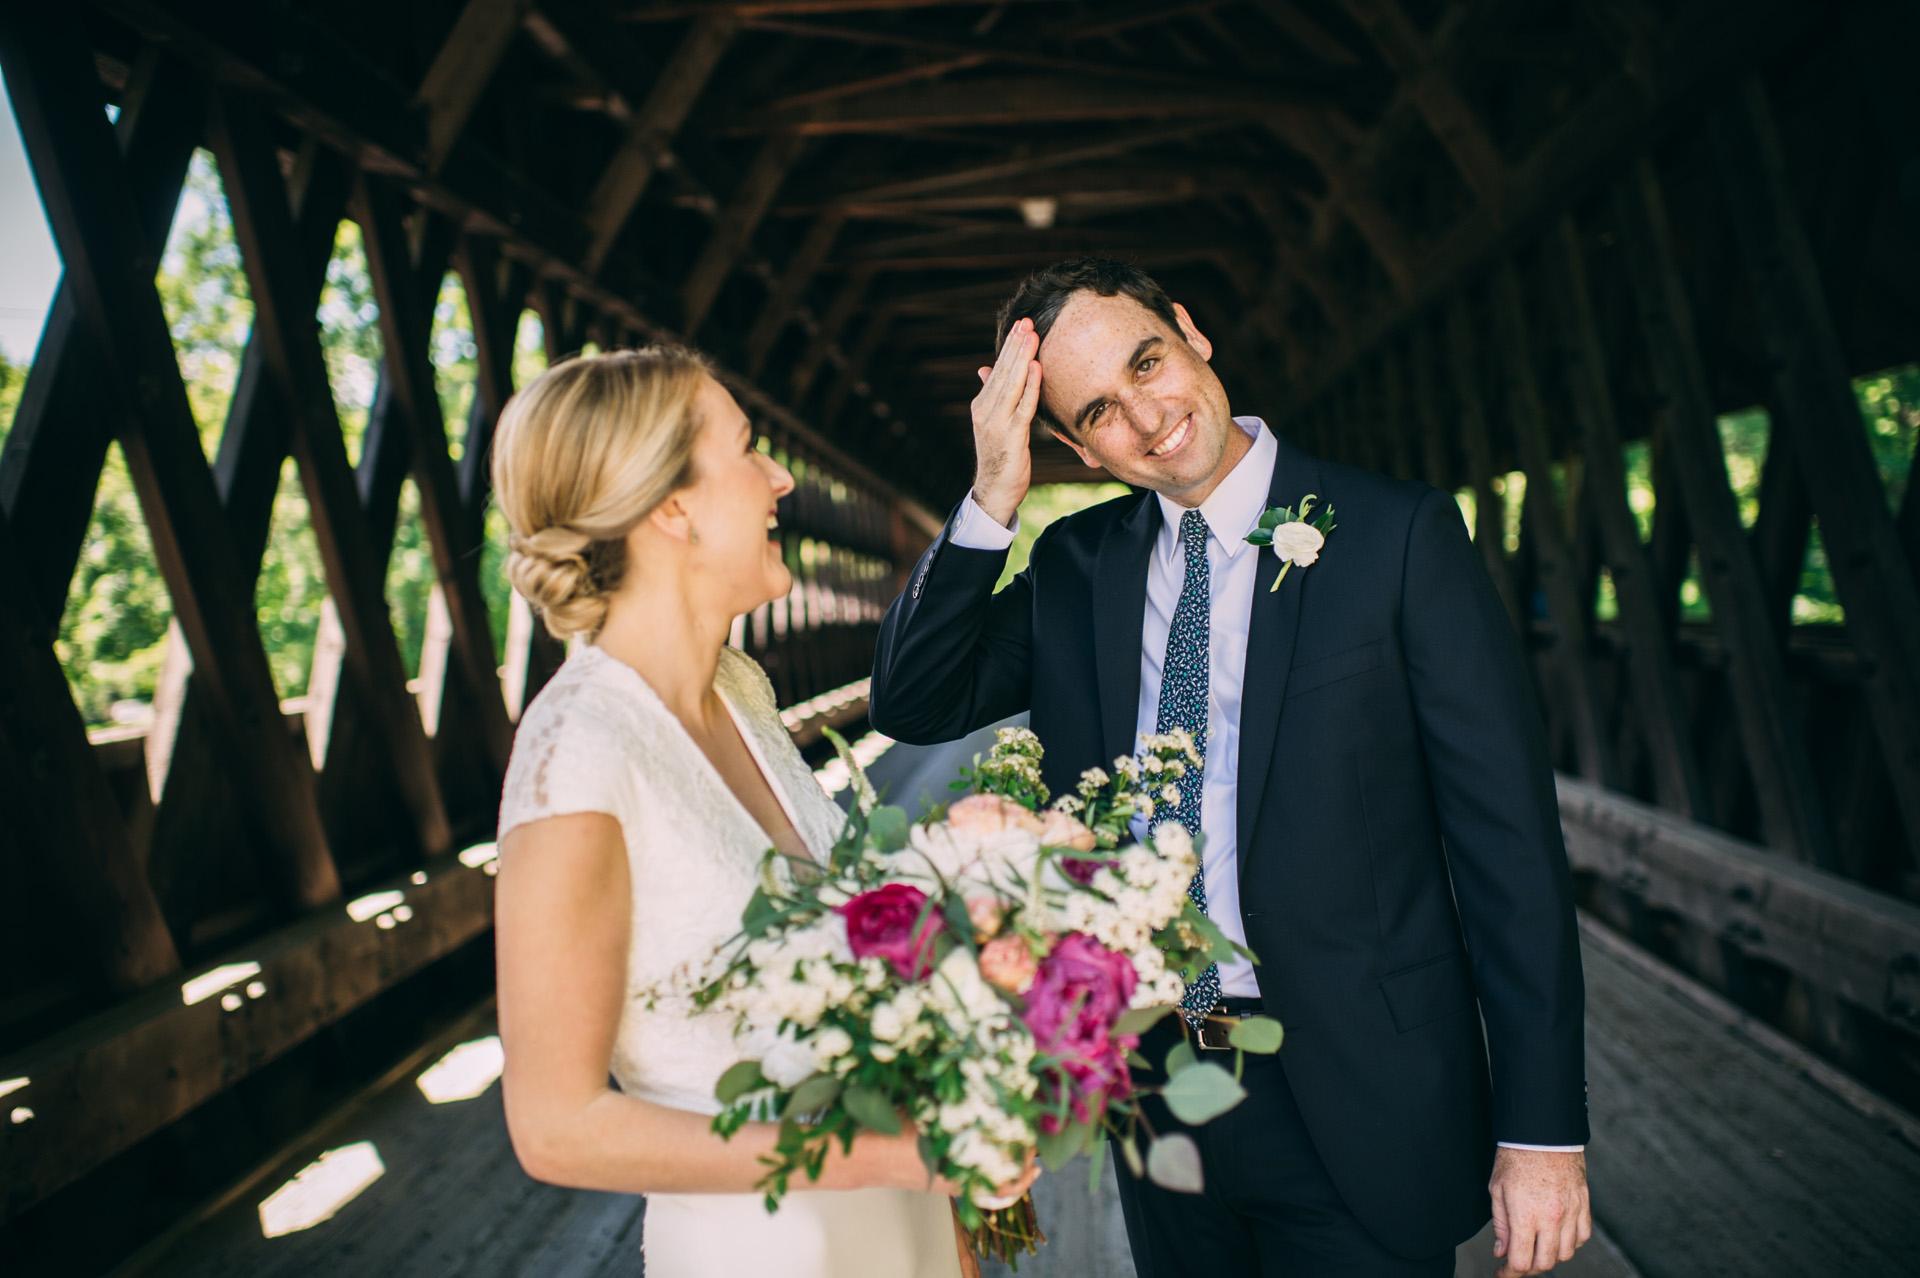 woodstock-inn-vermont-wedding-75